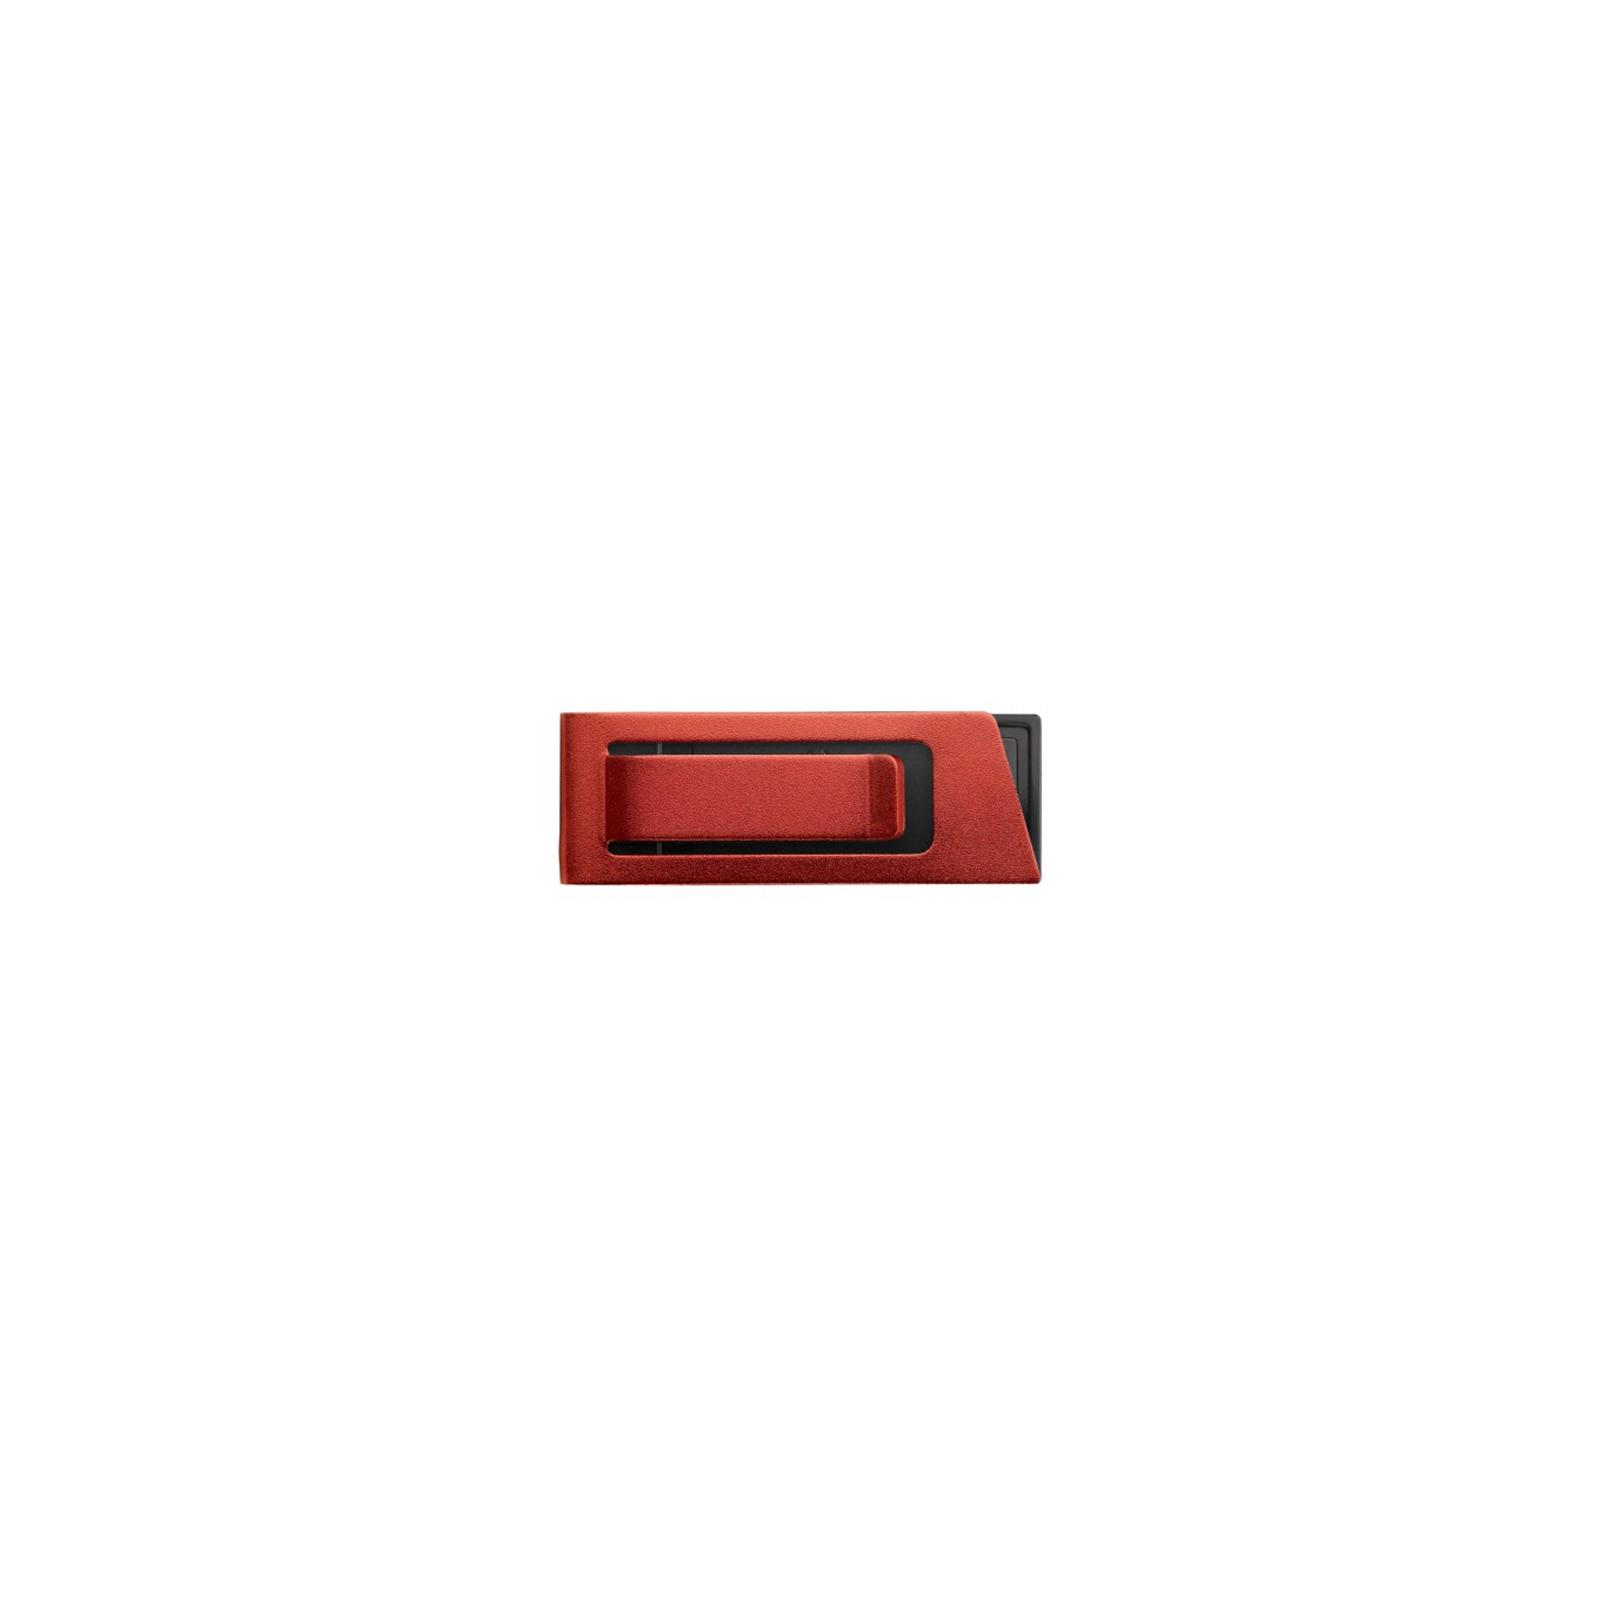 USB флеш накопитель 8GB AH130 Red RP USB2.0 Apacer (AP8GAH130R-1) изображение 2